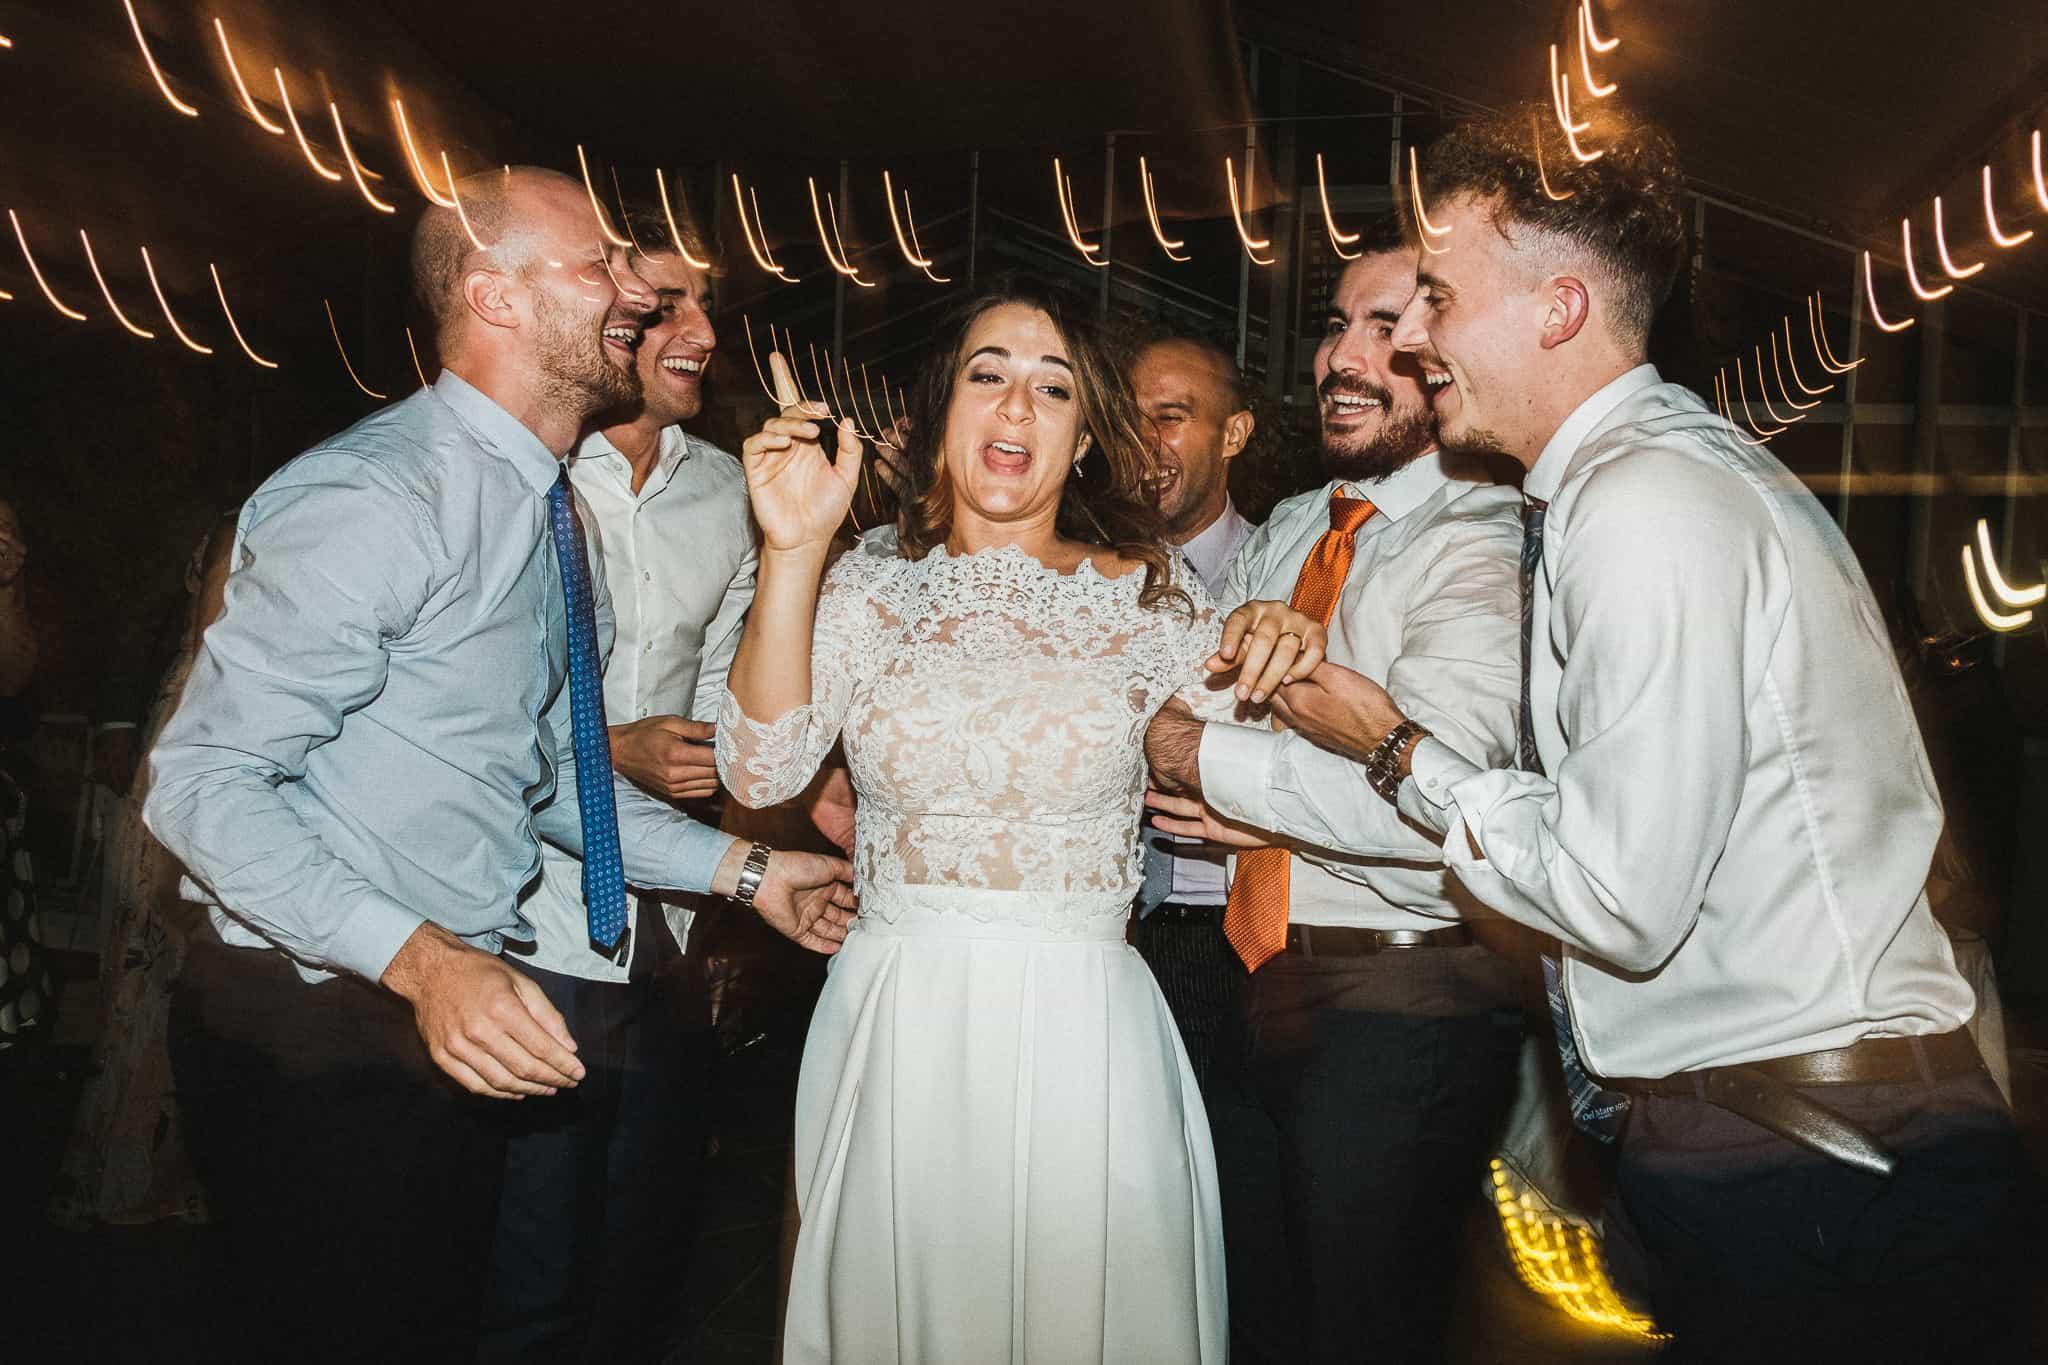 fotografo matrimonio reportage fondo brugarolo 0124